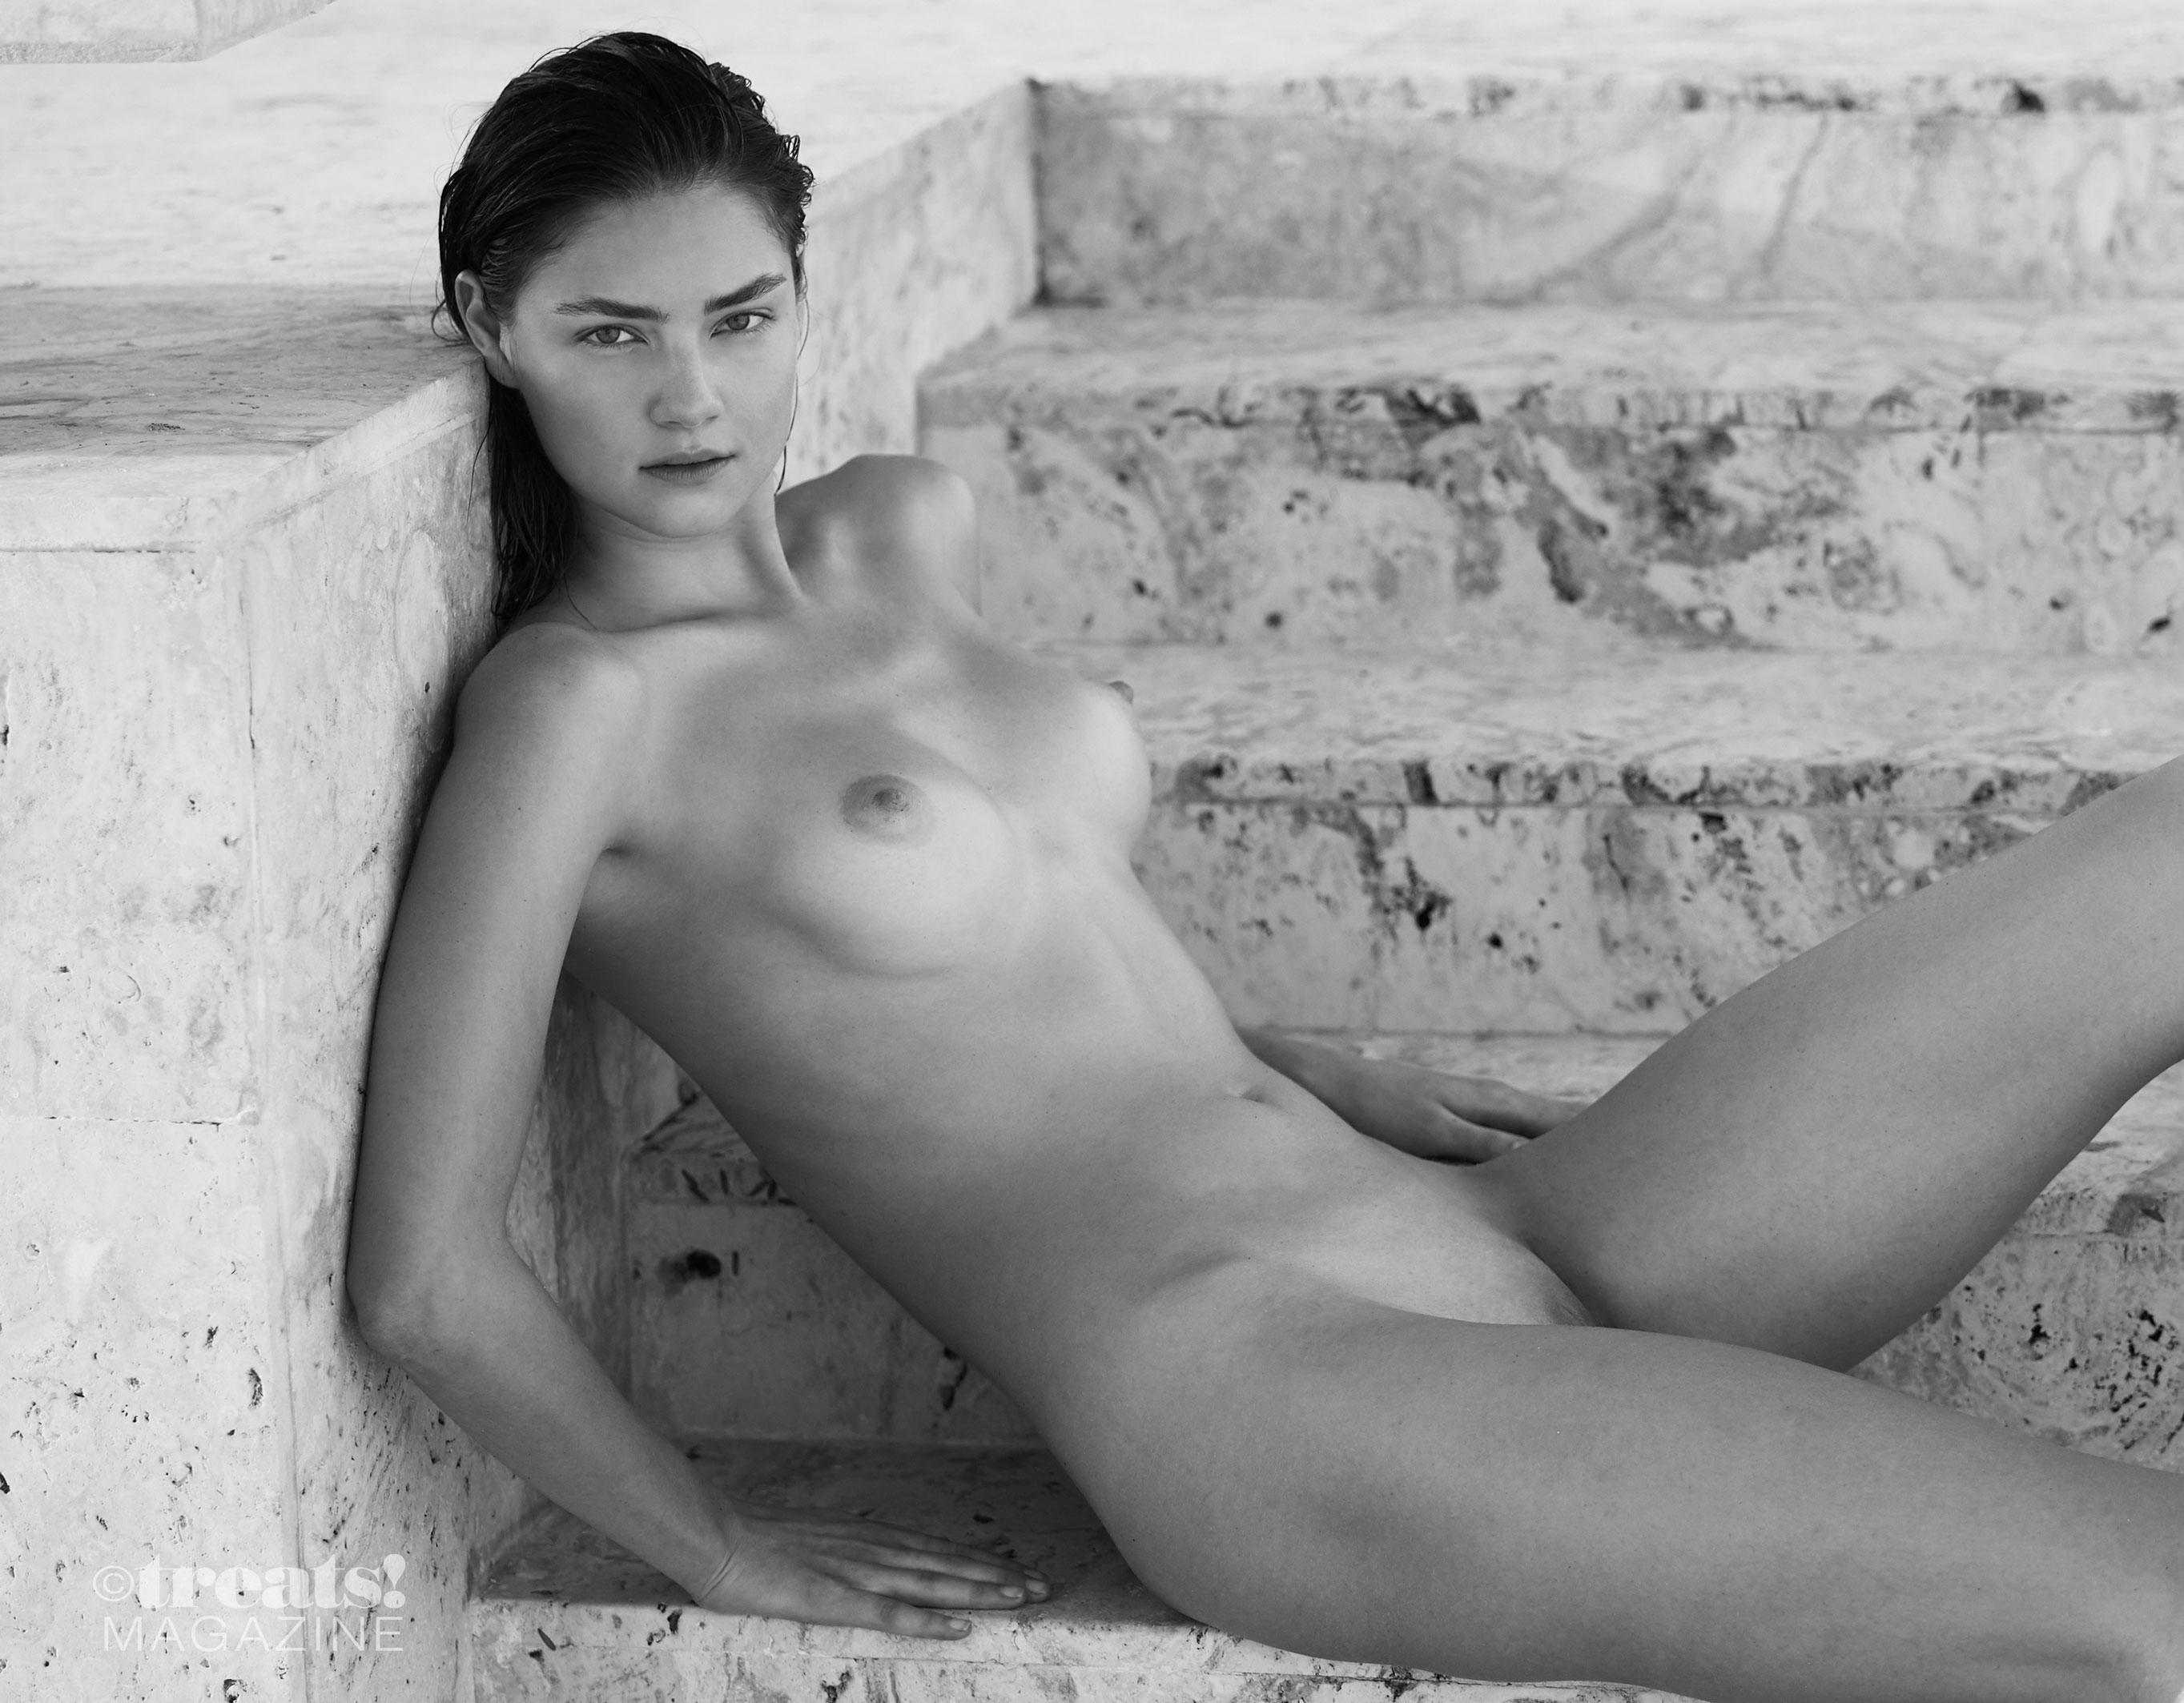 голая Вика Левина на страницах журнала Treats! / фото 15